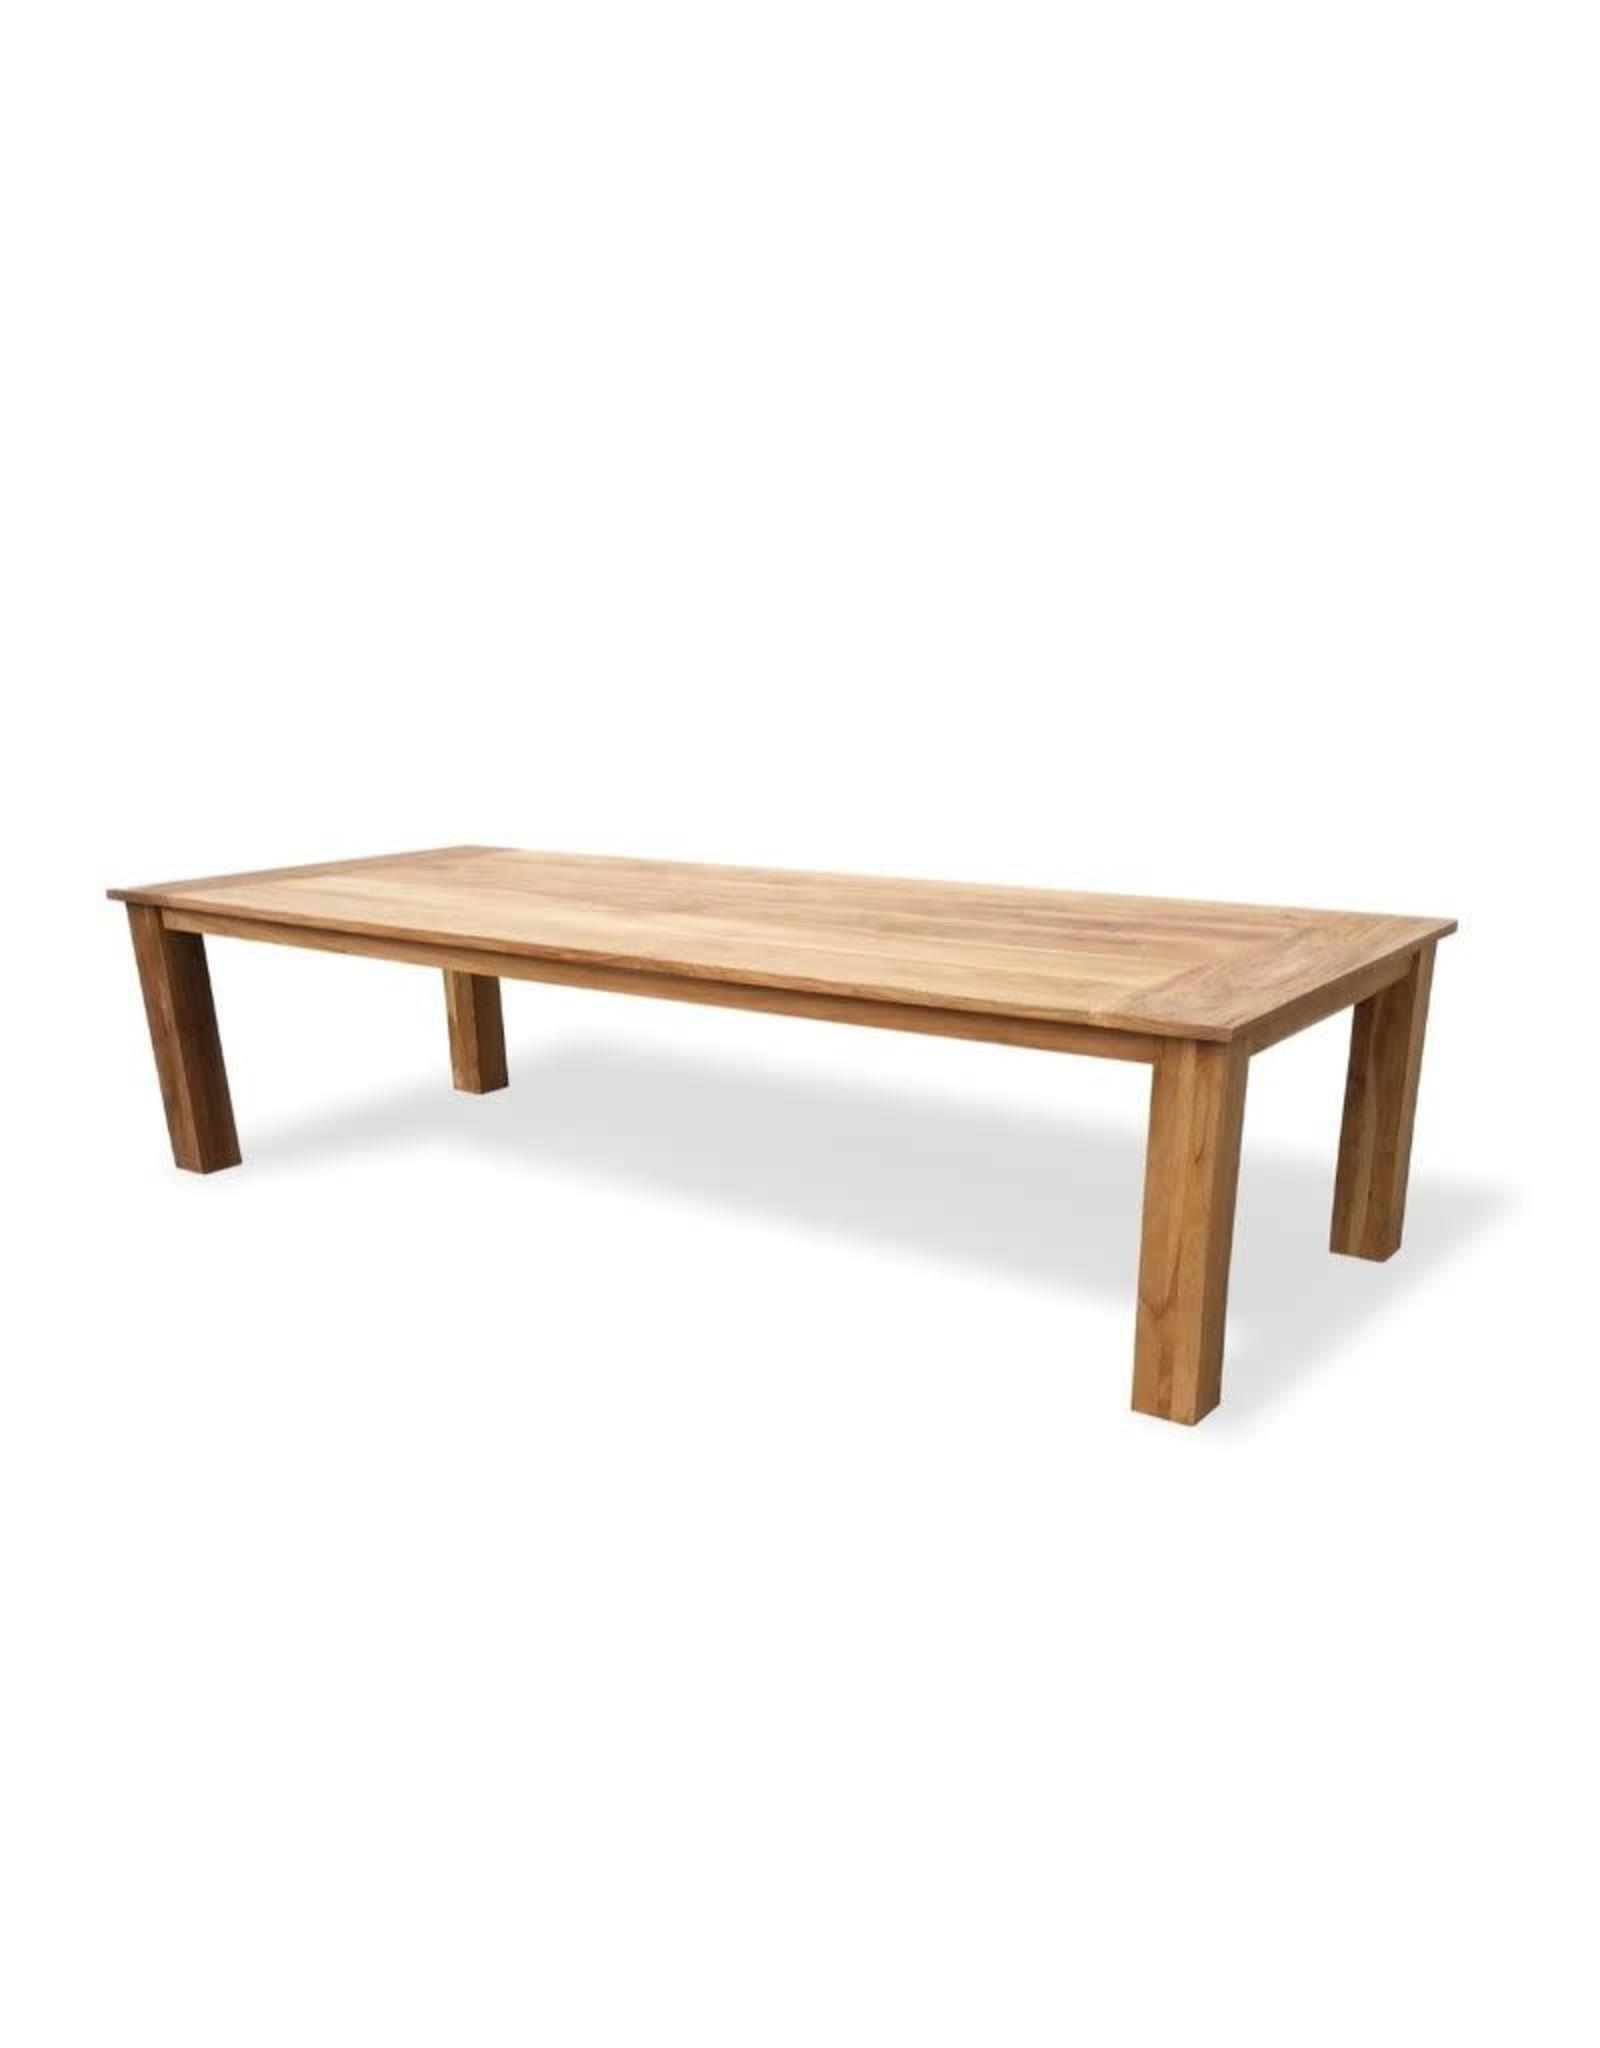 Hamilton Bay OUTDOOR Hamilton Bay Hercules tafel 300x100cm teak